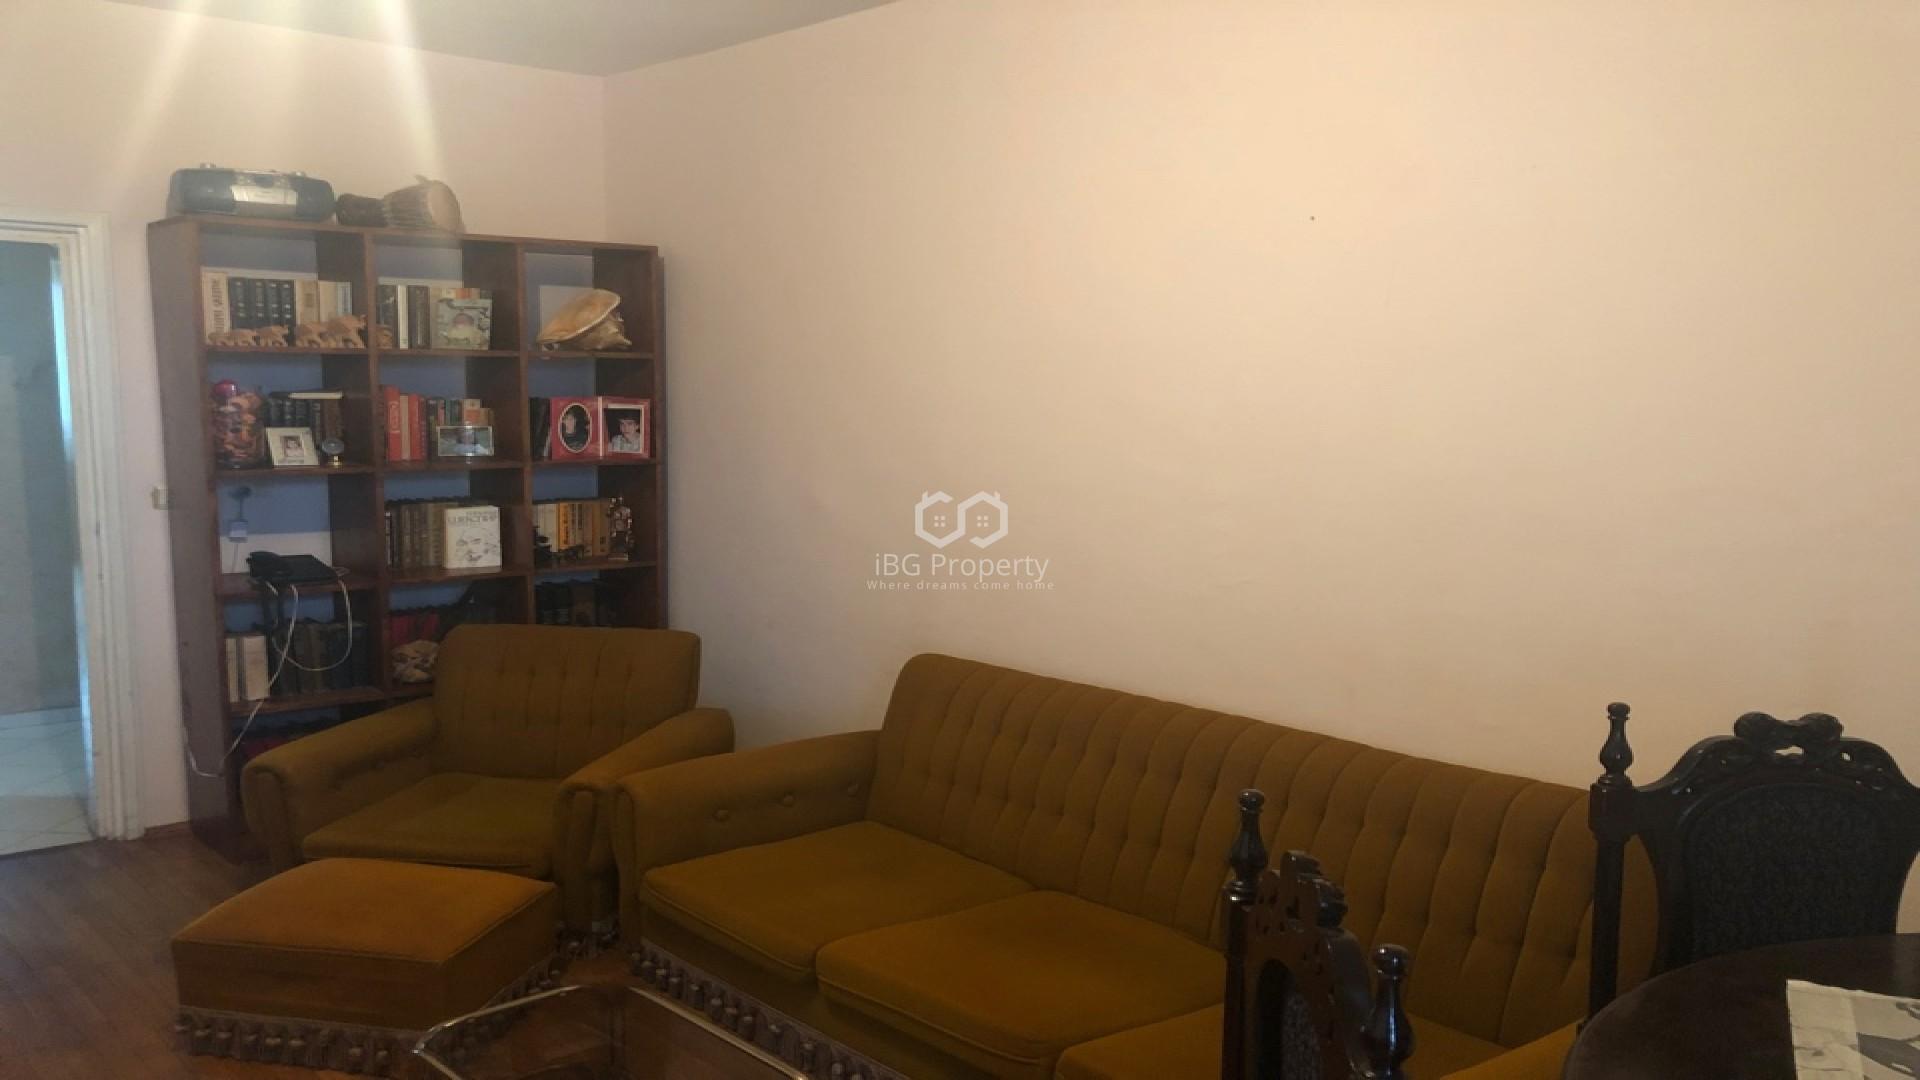 Тристаен апартамент Широк център Варна 91 m2